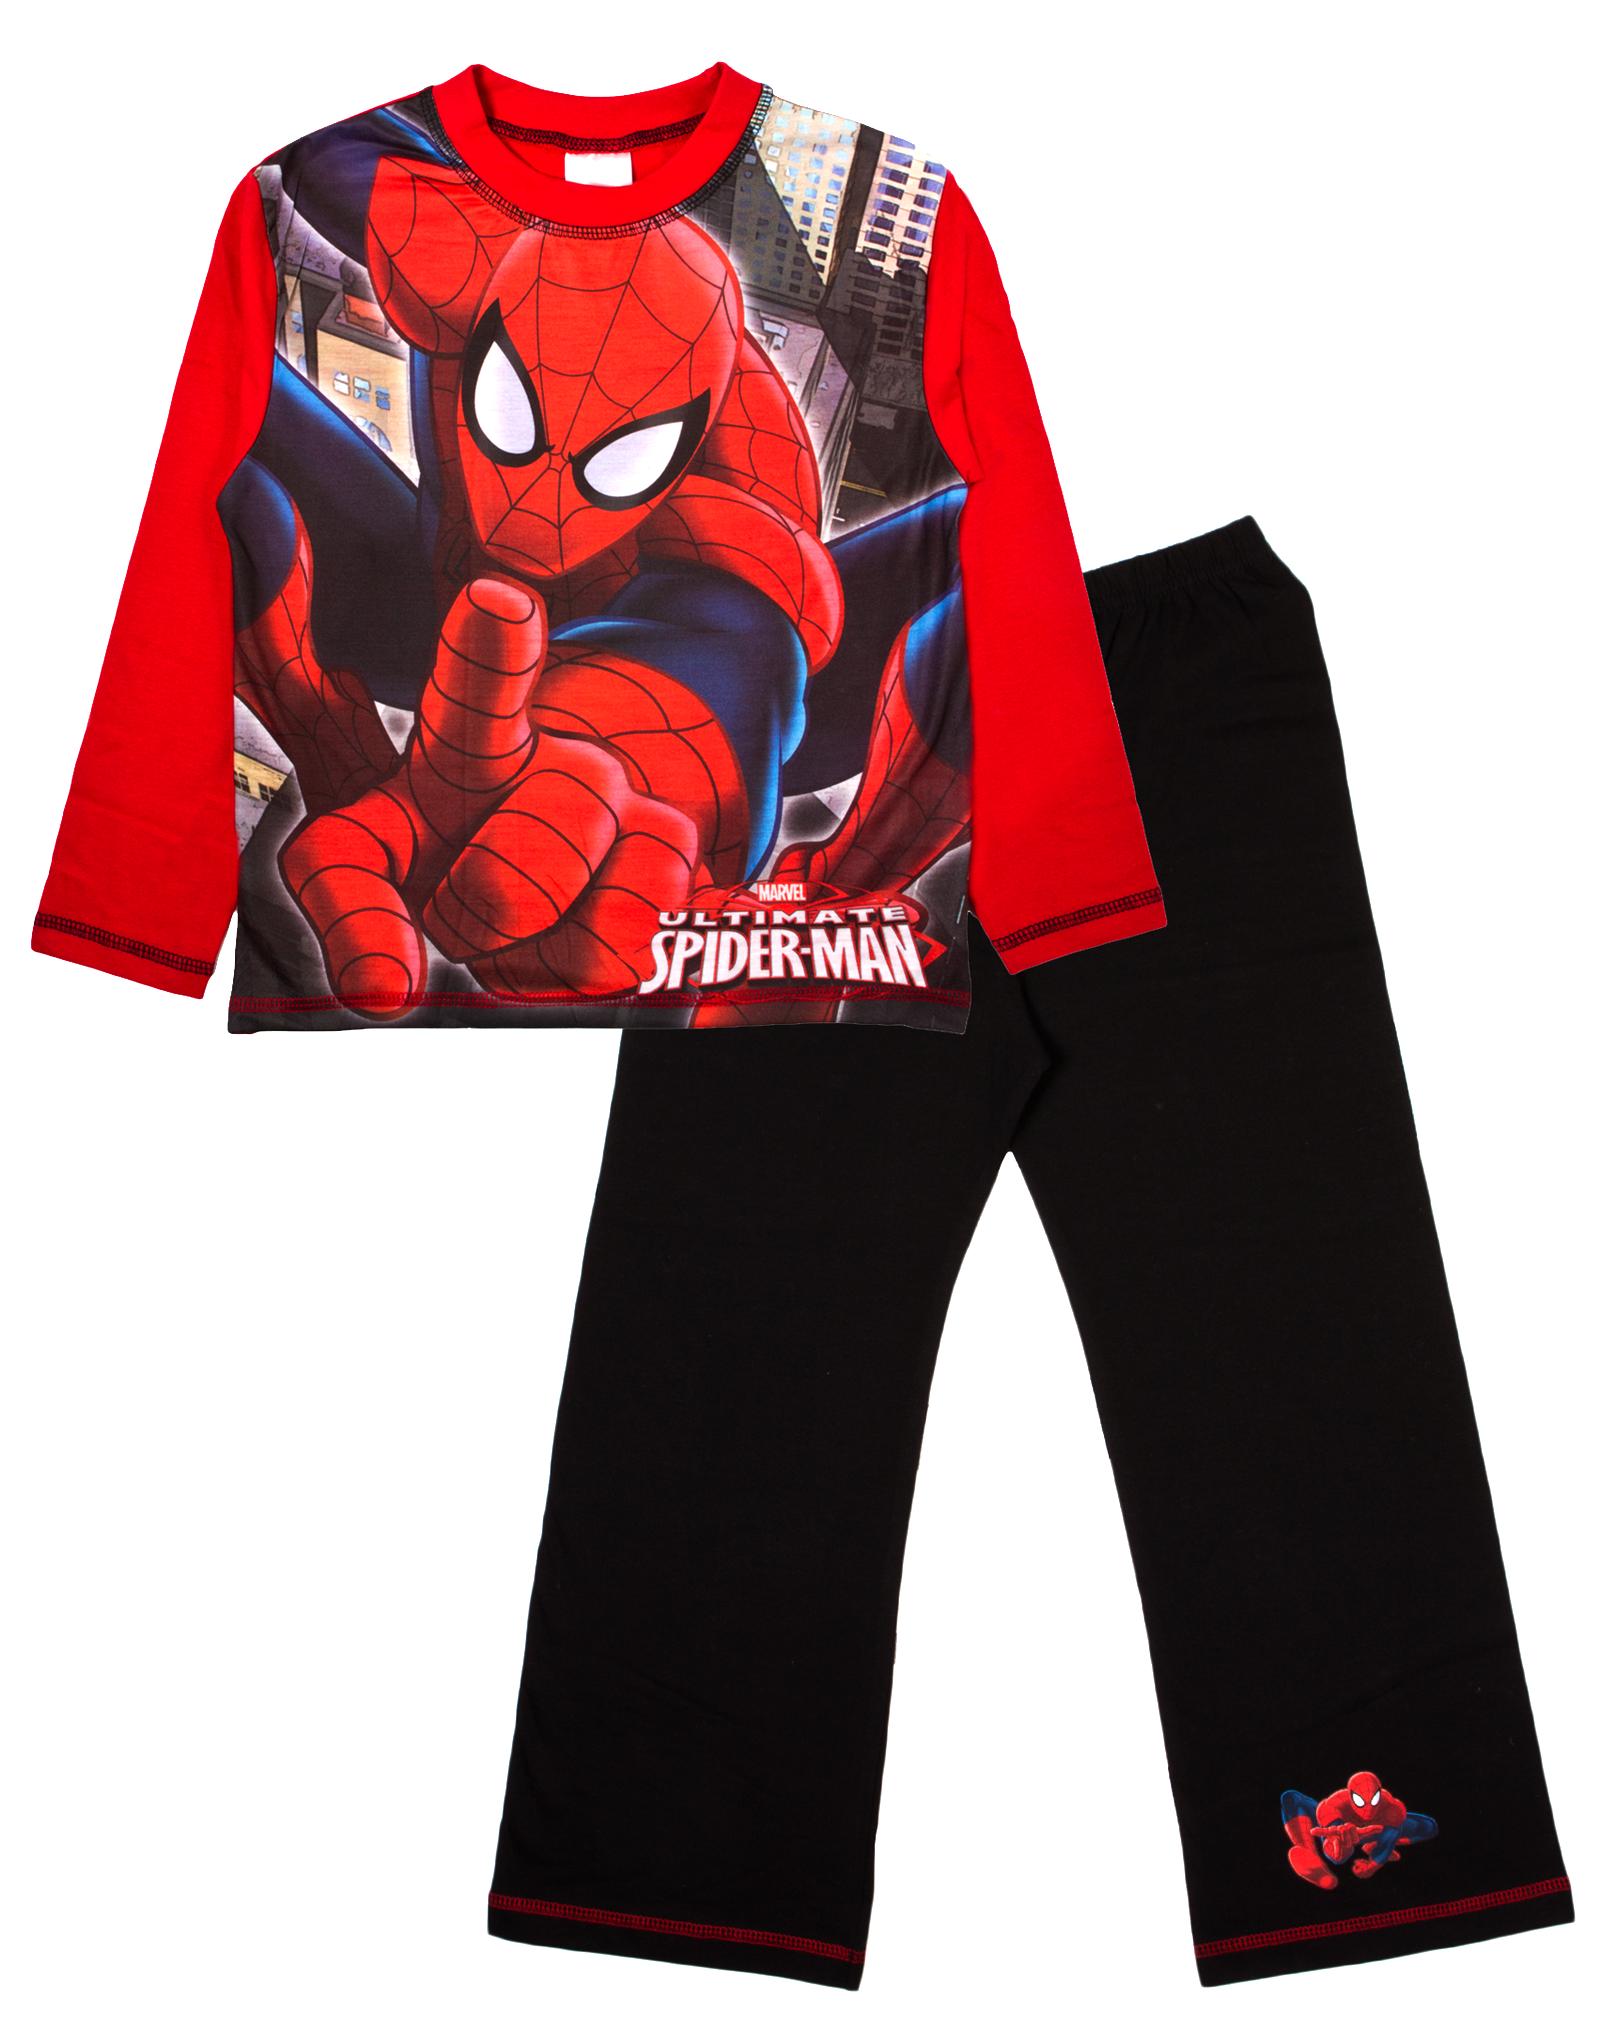 6198277fce00 Kids Boys Pyjamas Marvel Spiderman Pyjama Set 2 Piece Pjs Long Size ...